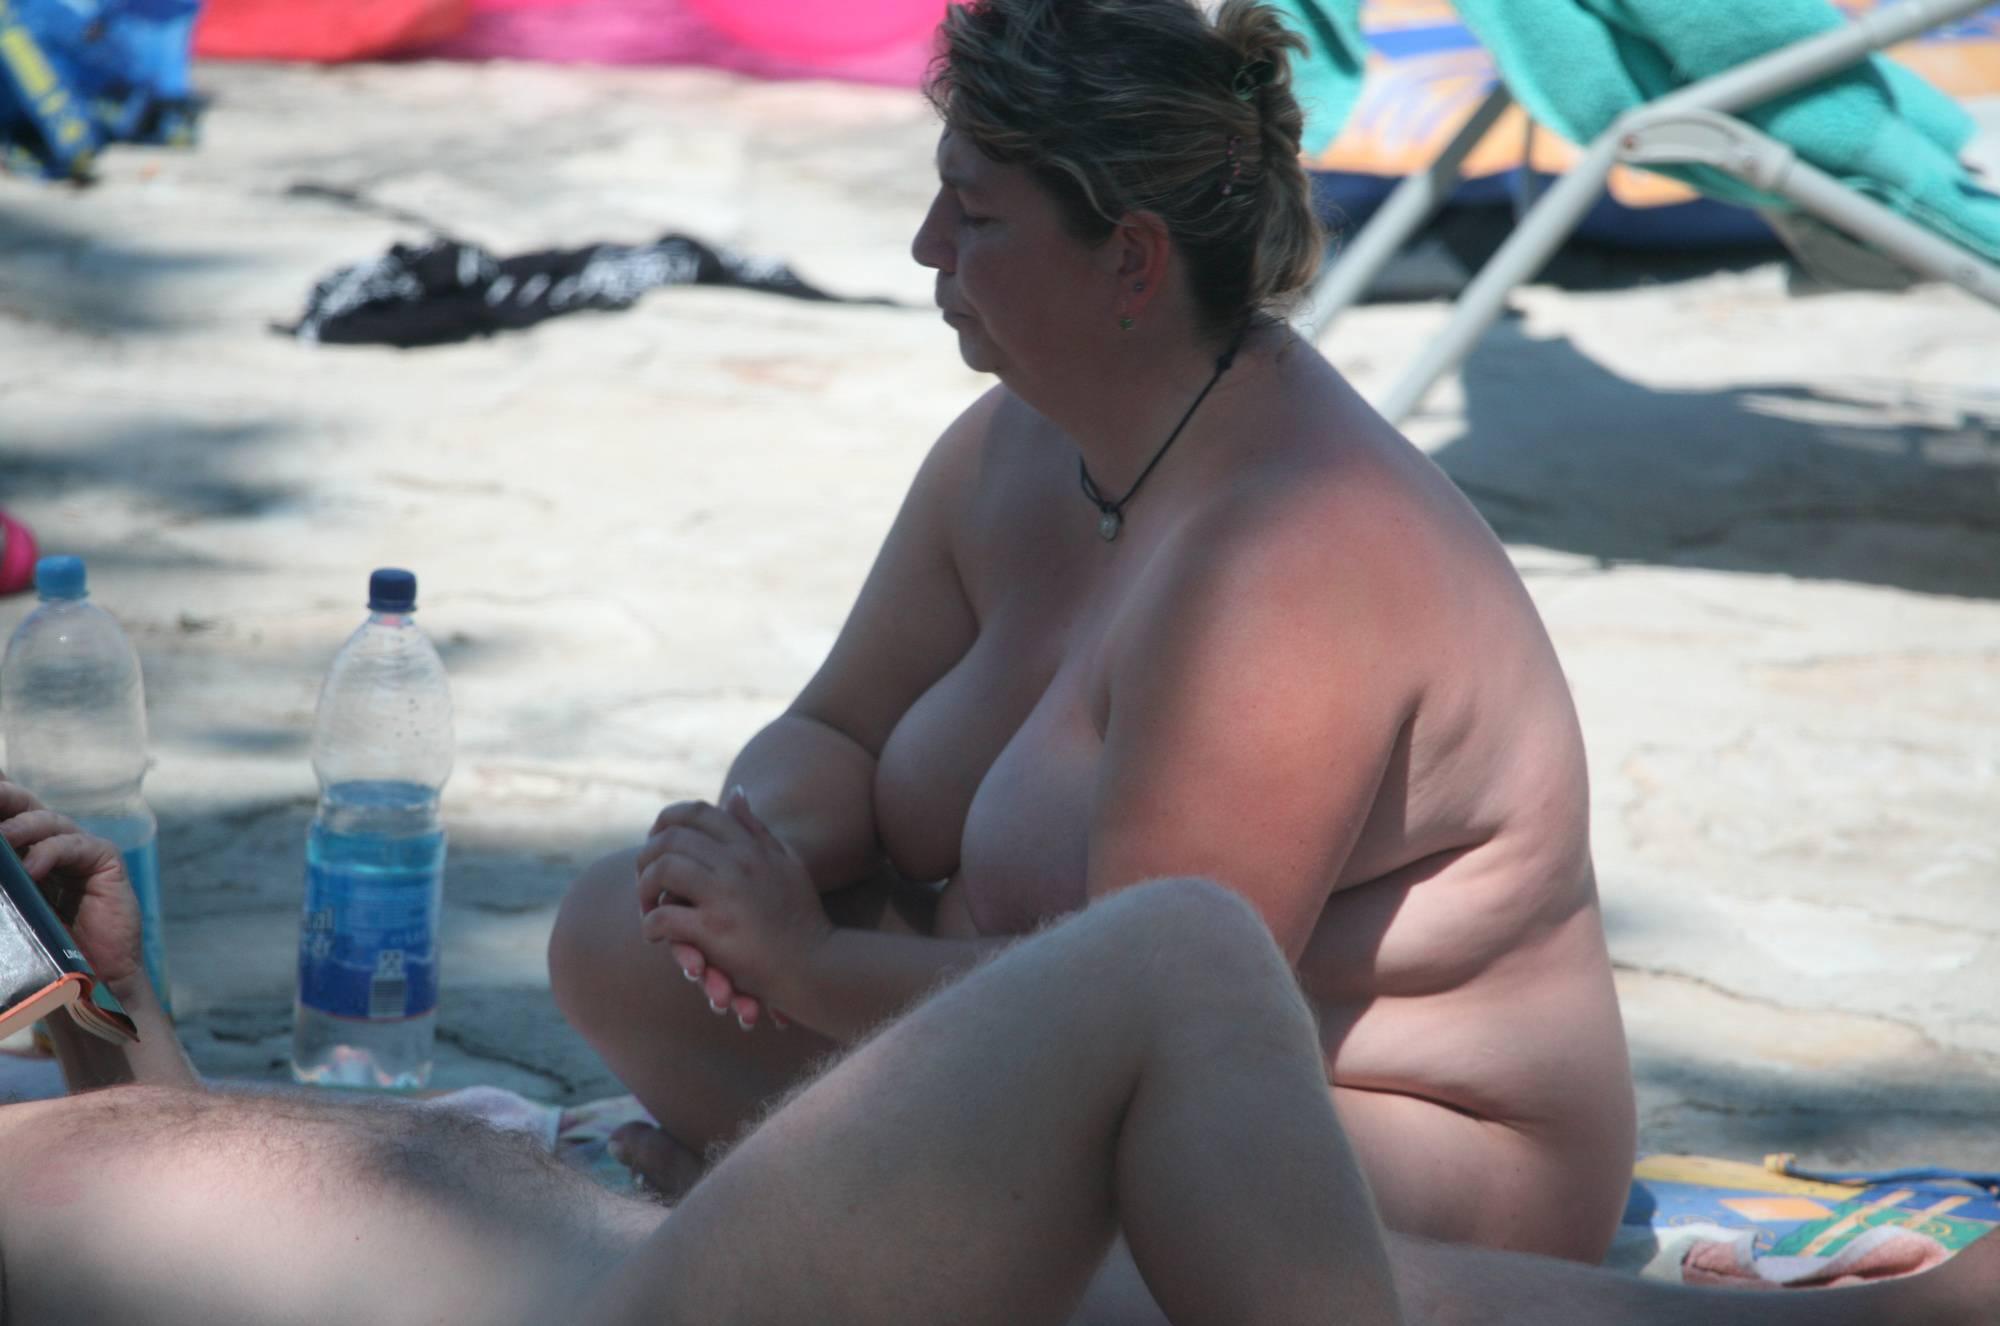 Avilia FKK Nude Lake Shore - 1